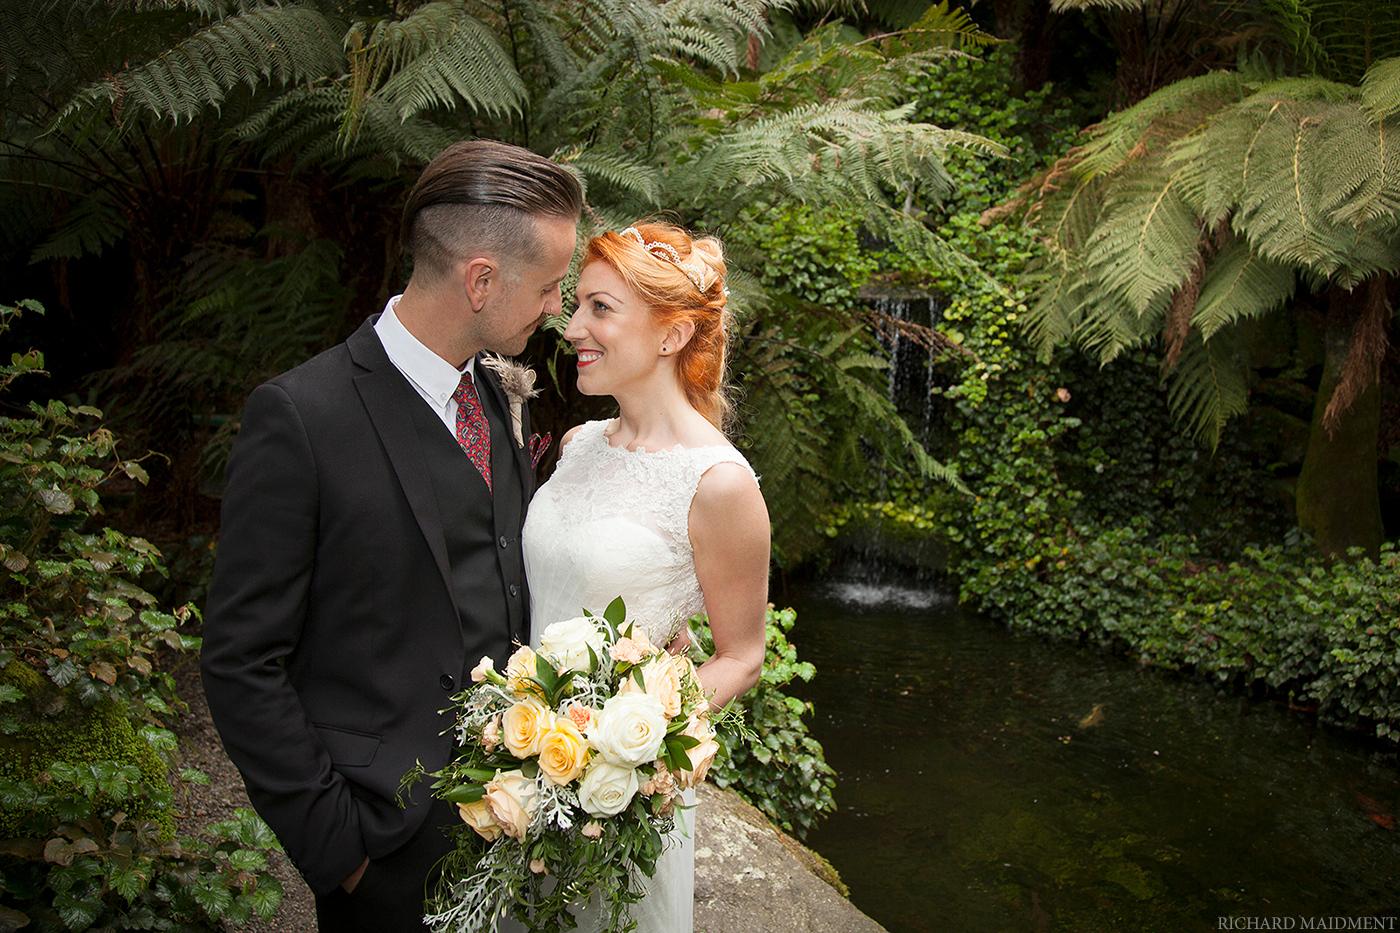 Richard Maidment - Wedding Photography (111).jpg